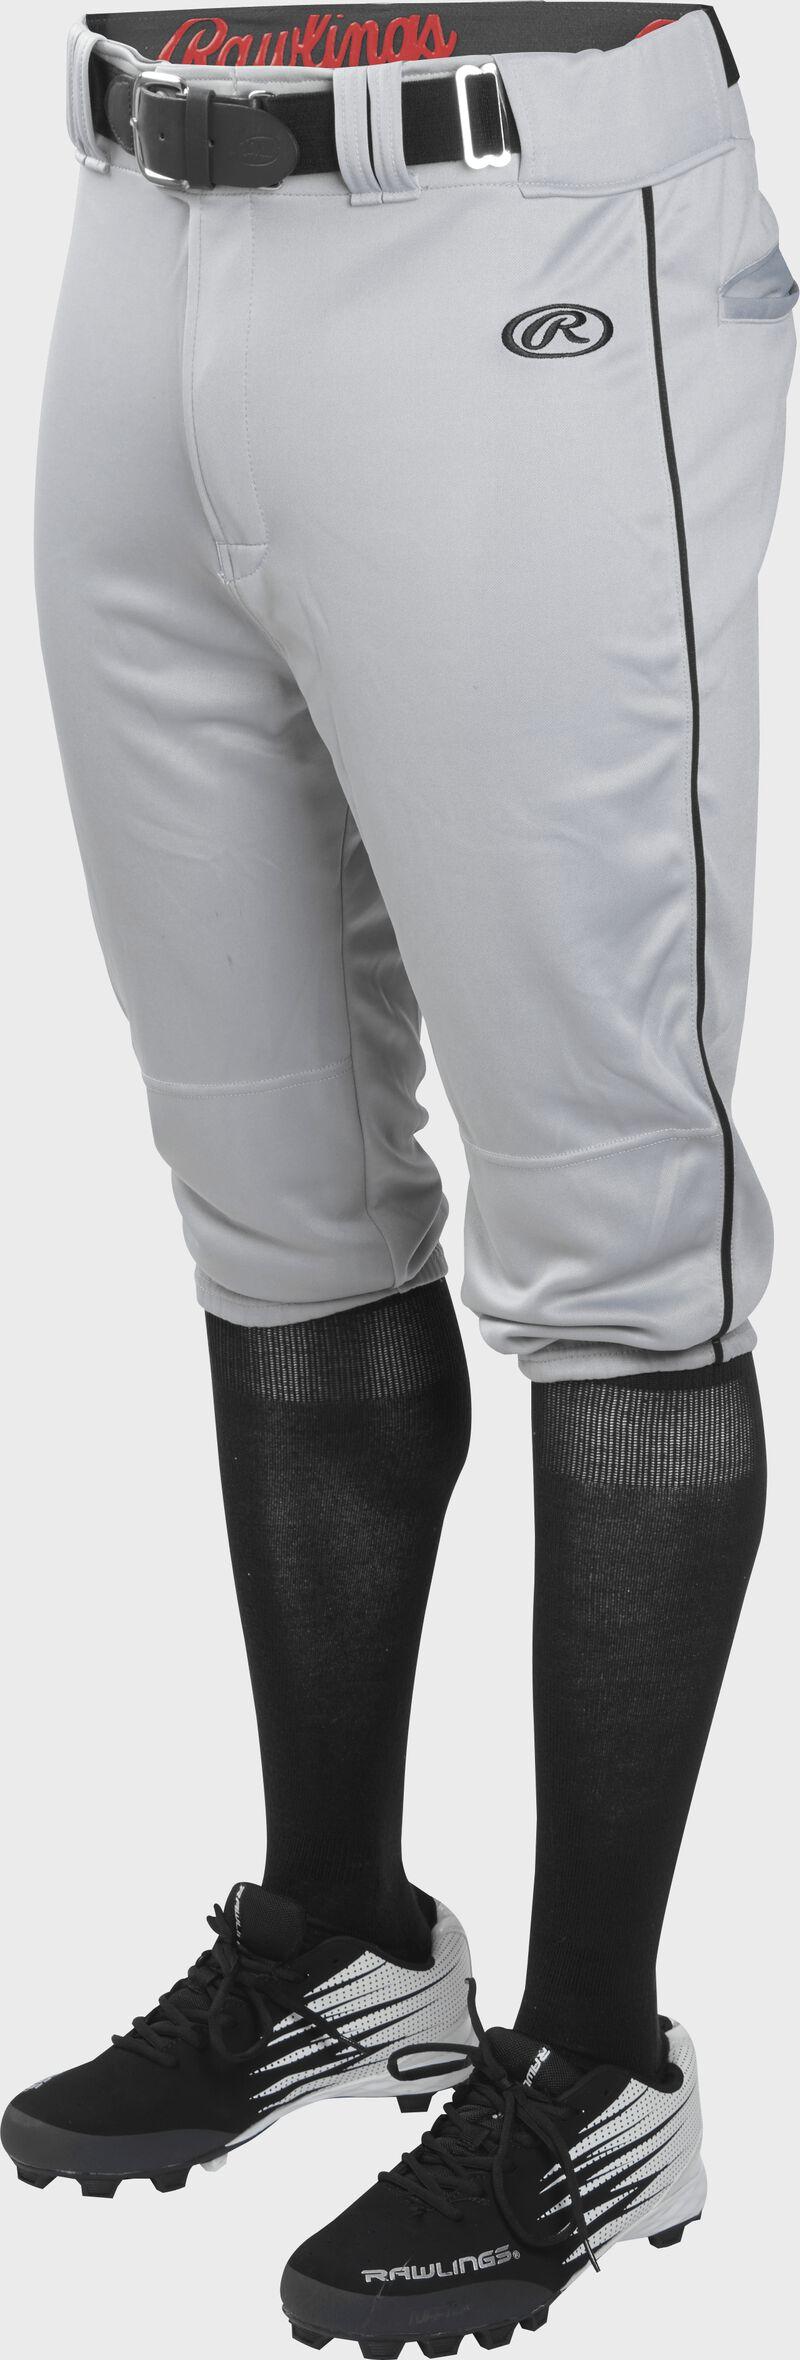 Front of Rawlings Blue Gray/Black Adult Launch Piped Knicker Baseball Pant - SKU #LNCHKPP-BG/B